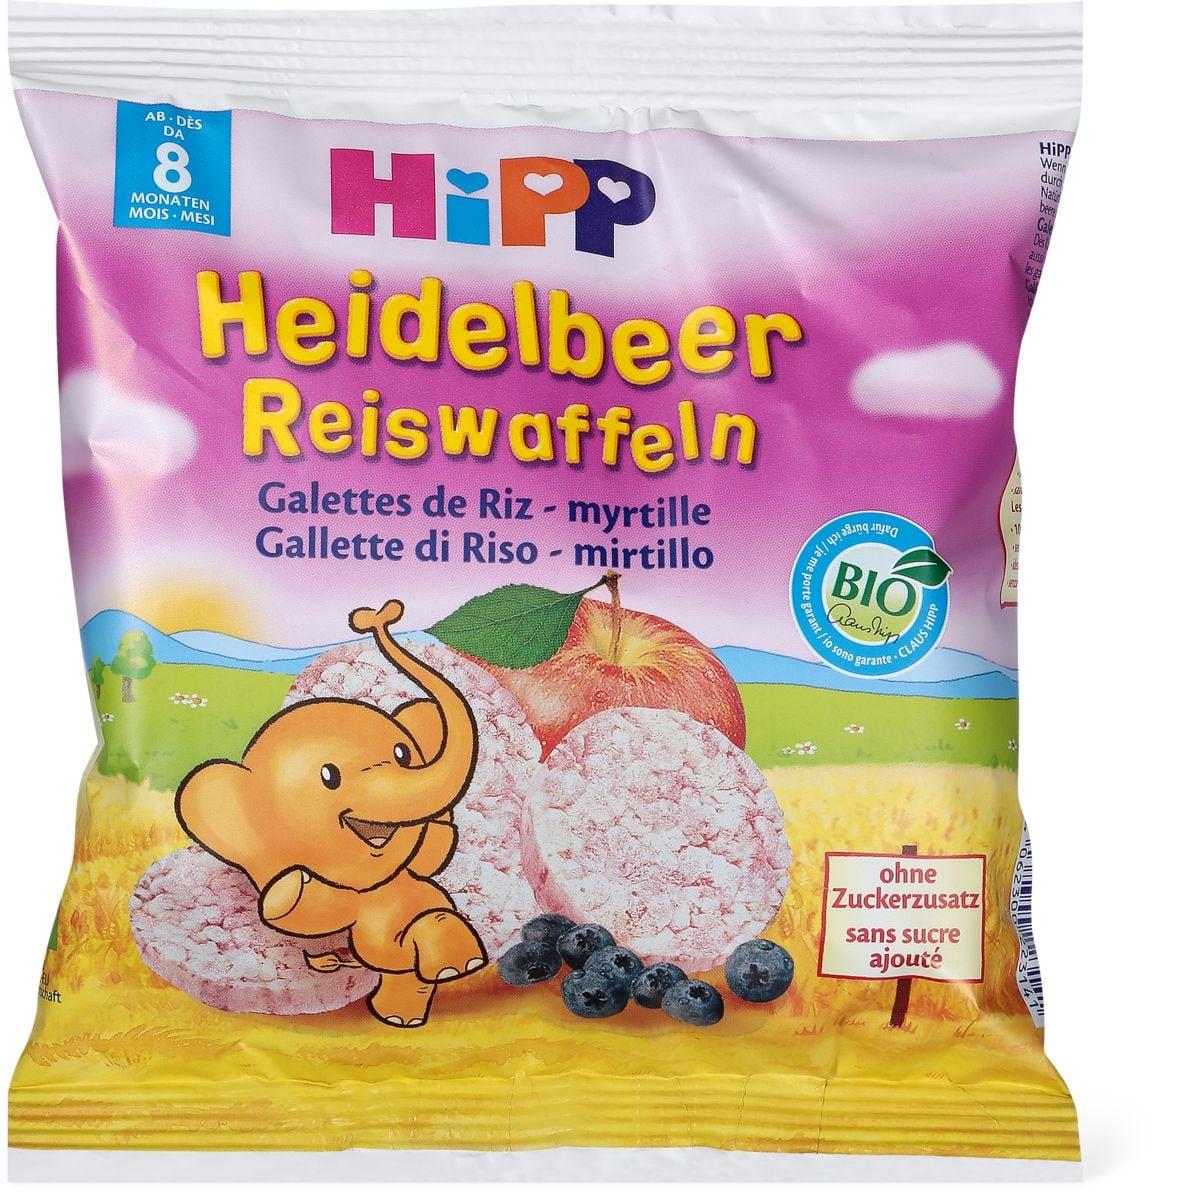 HiPP Reiswaffeln Heidelbeer